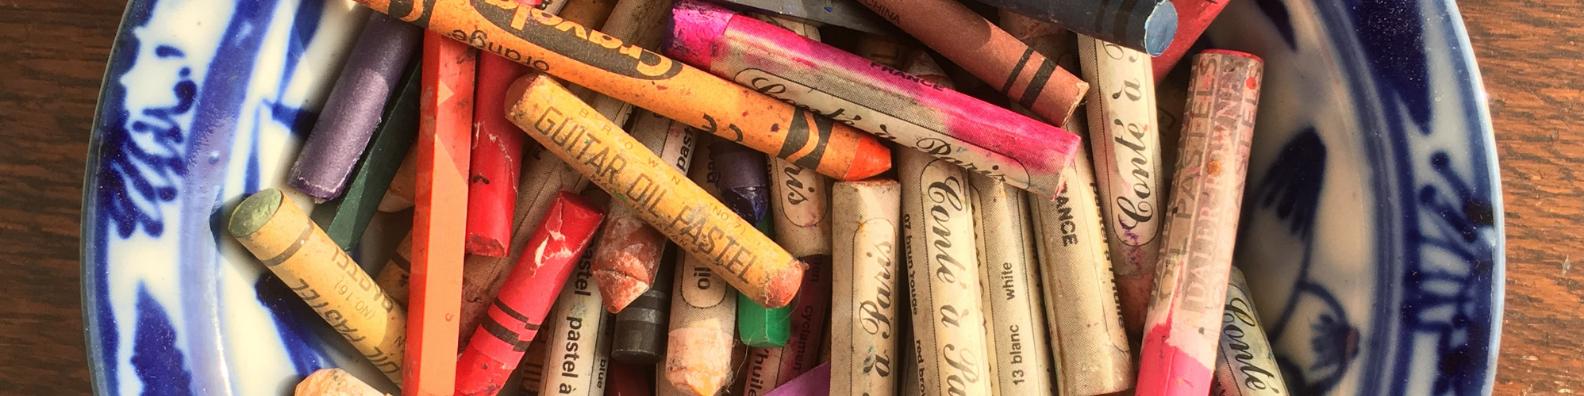 crayons Emma Cameron Art Psychotherapy